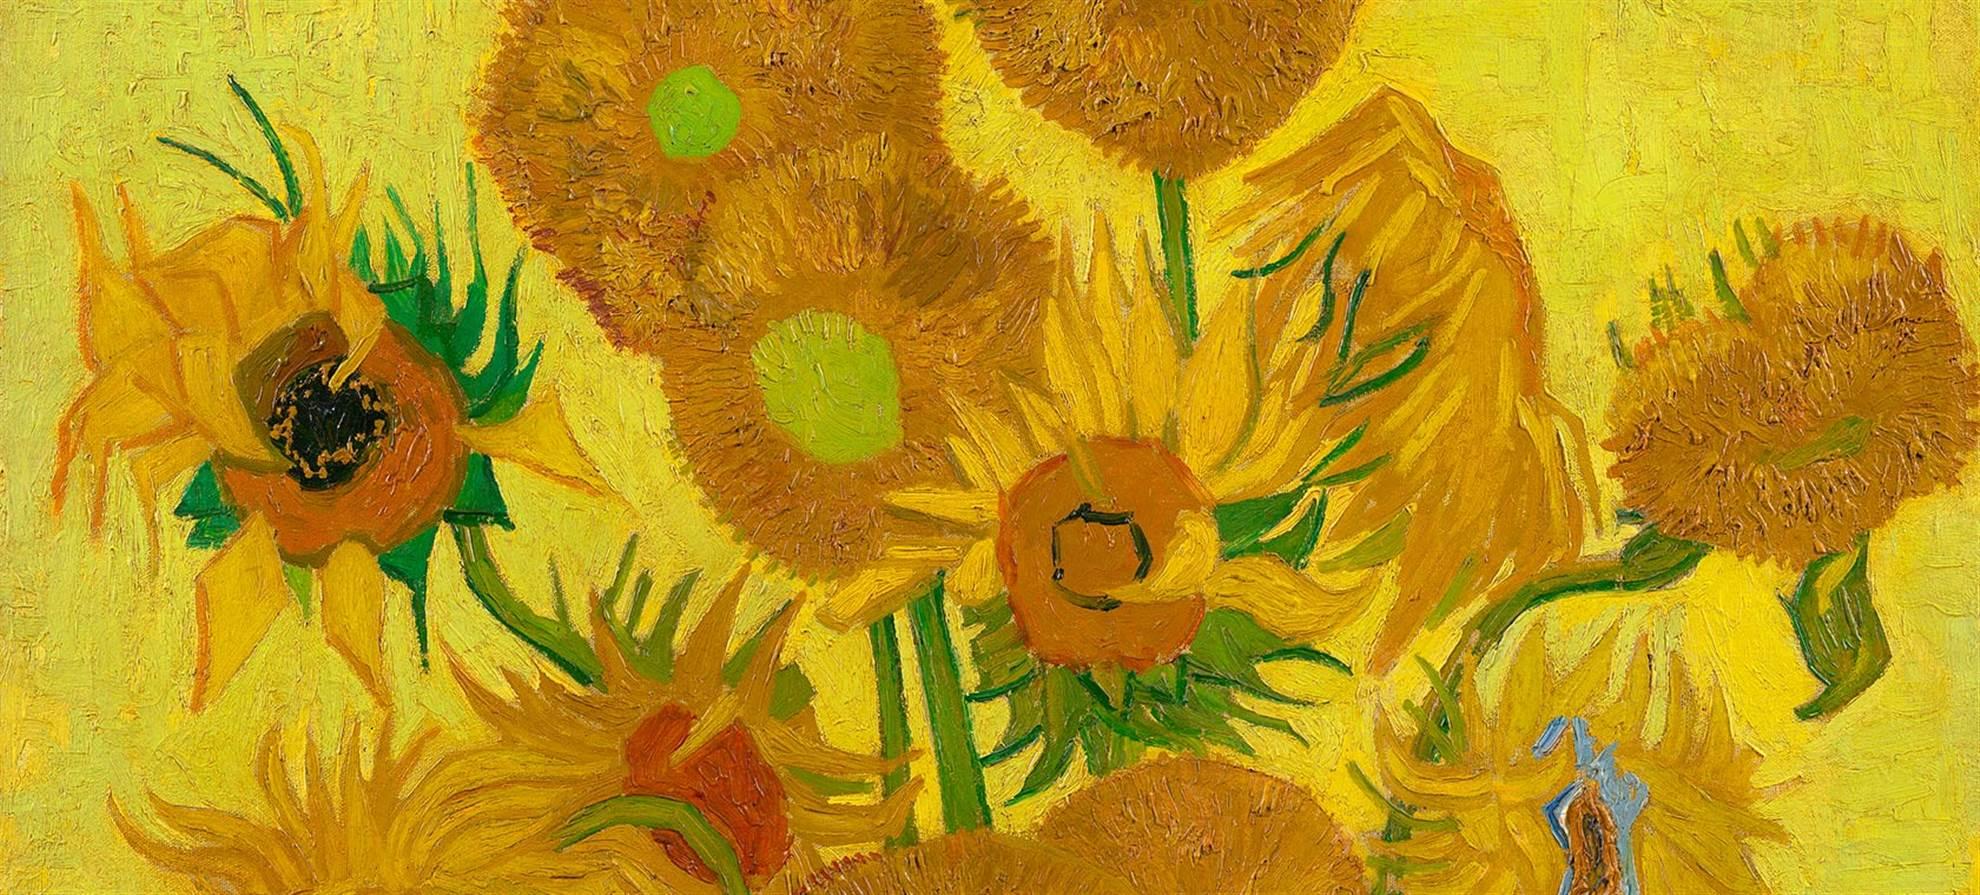 Musée van Gogh (Visite Privée)